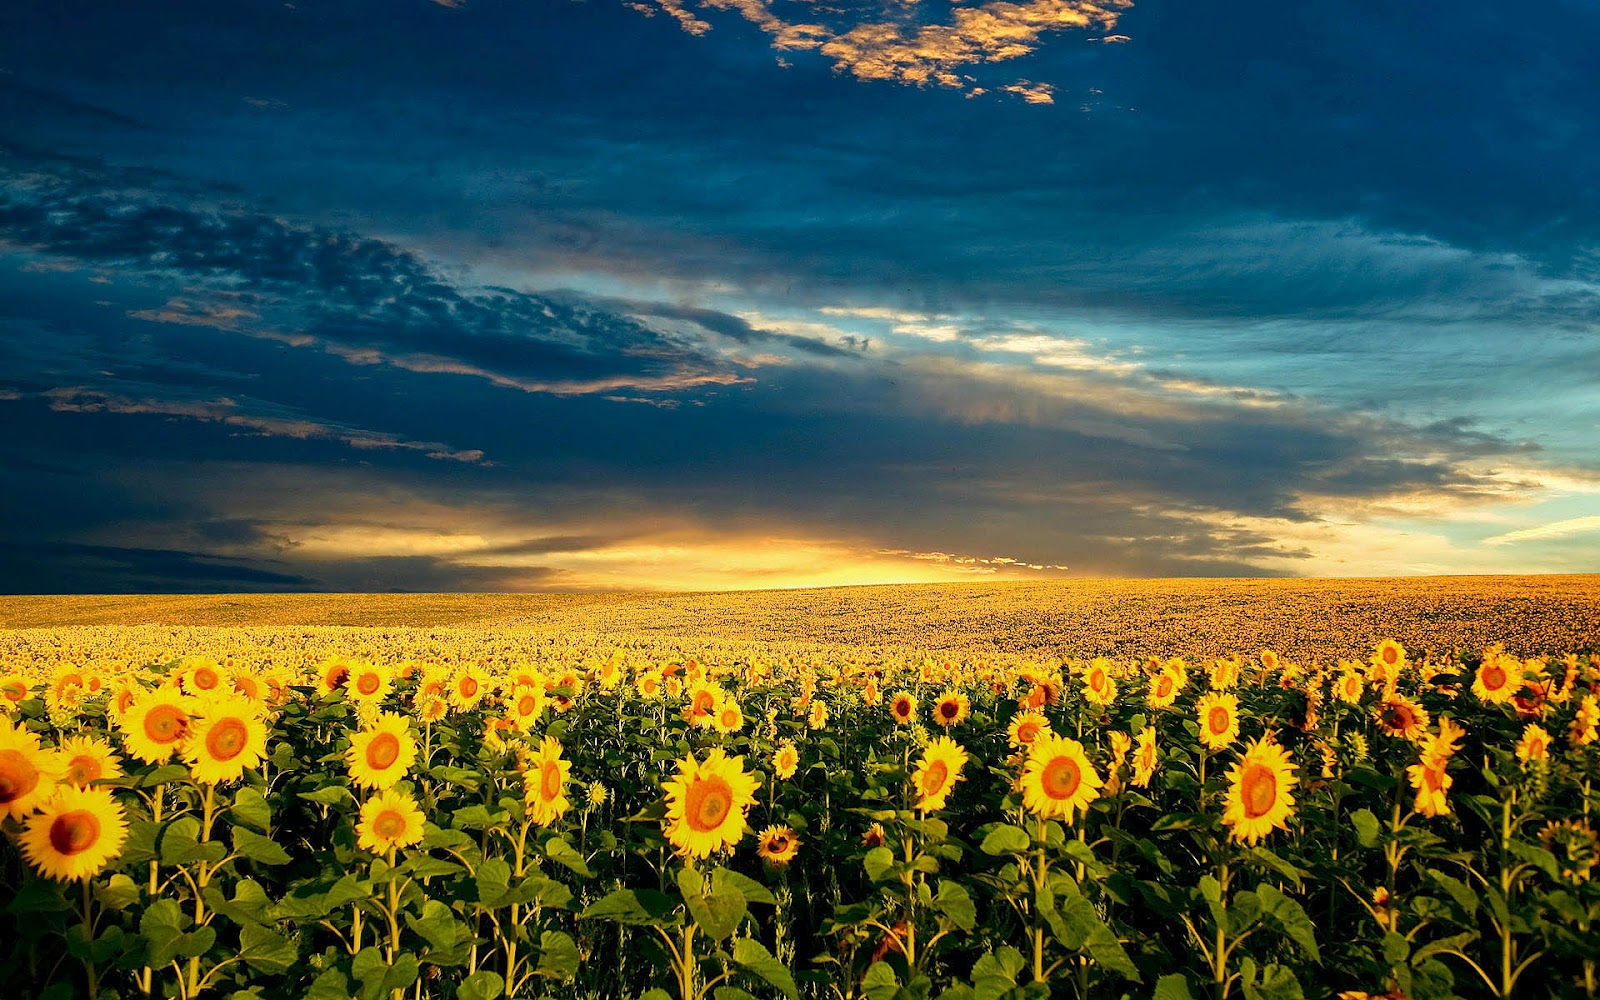 3d Wallpaper Desktop For Windows Xp Hd Sunflowers Wallpapers Top Best Hd Wallpapers For Desktop